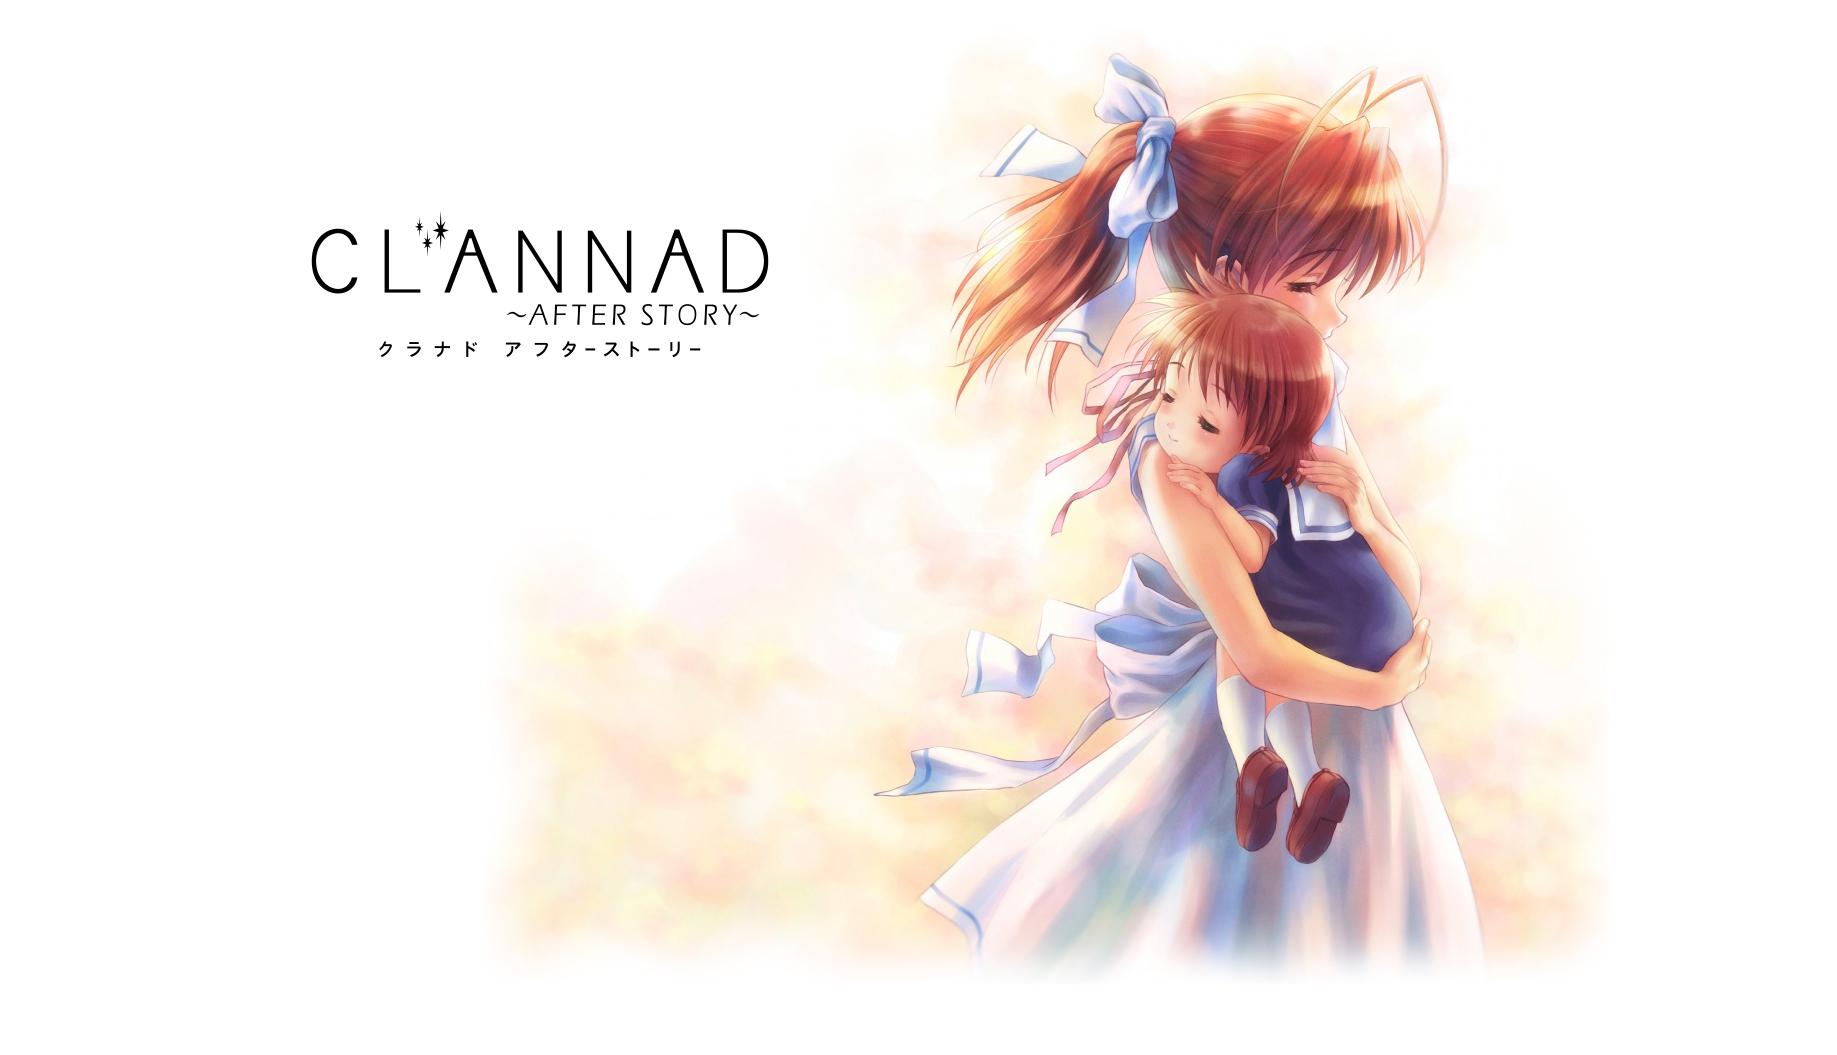 Favorite Anime Quotes. - Clannad Nagisa Furukawa's Quote ...